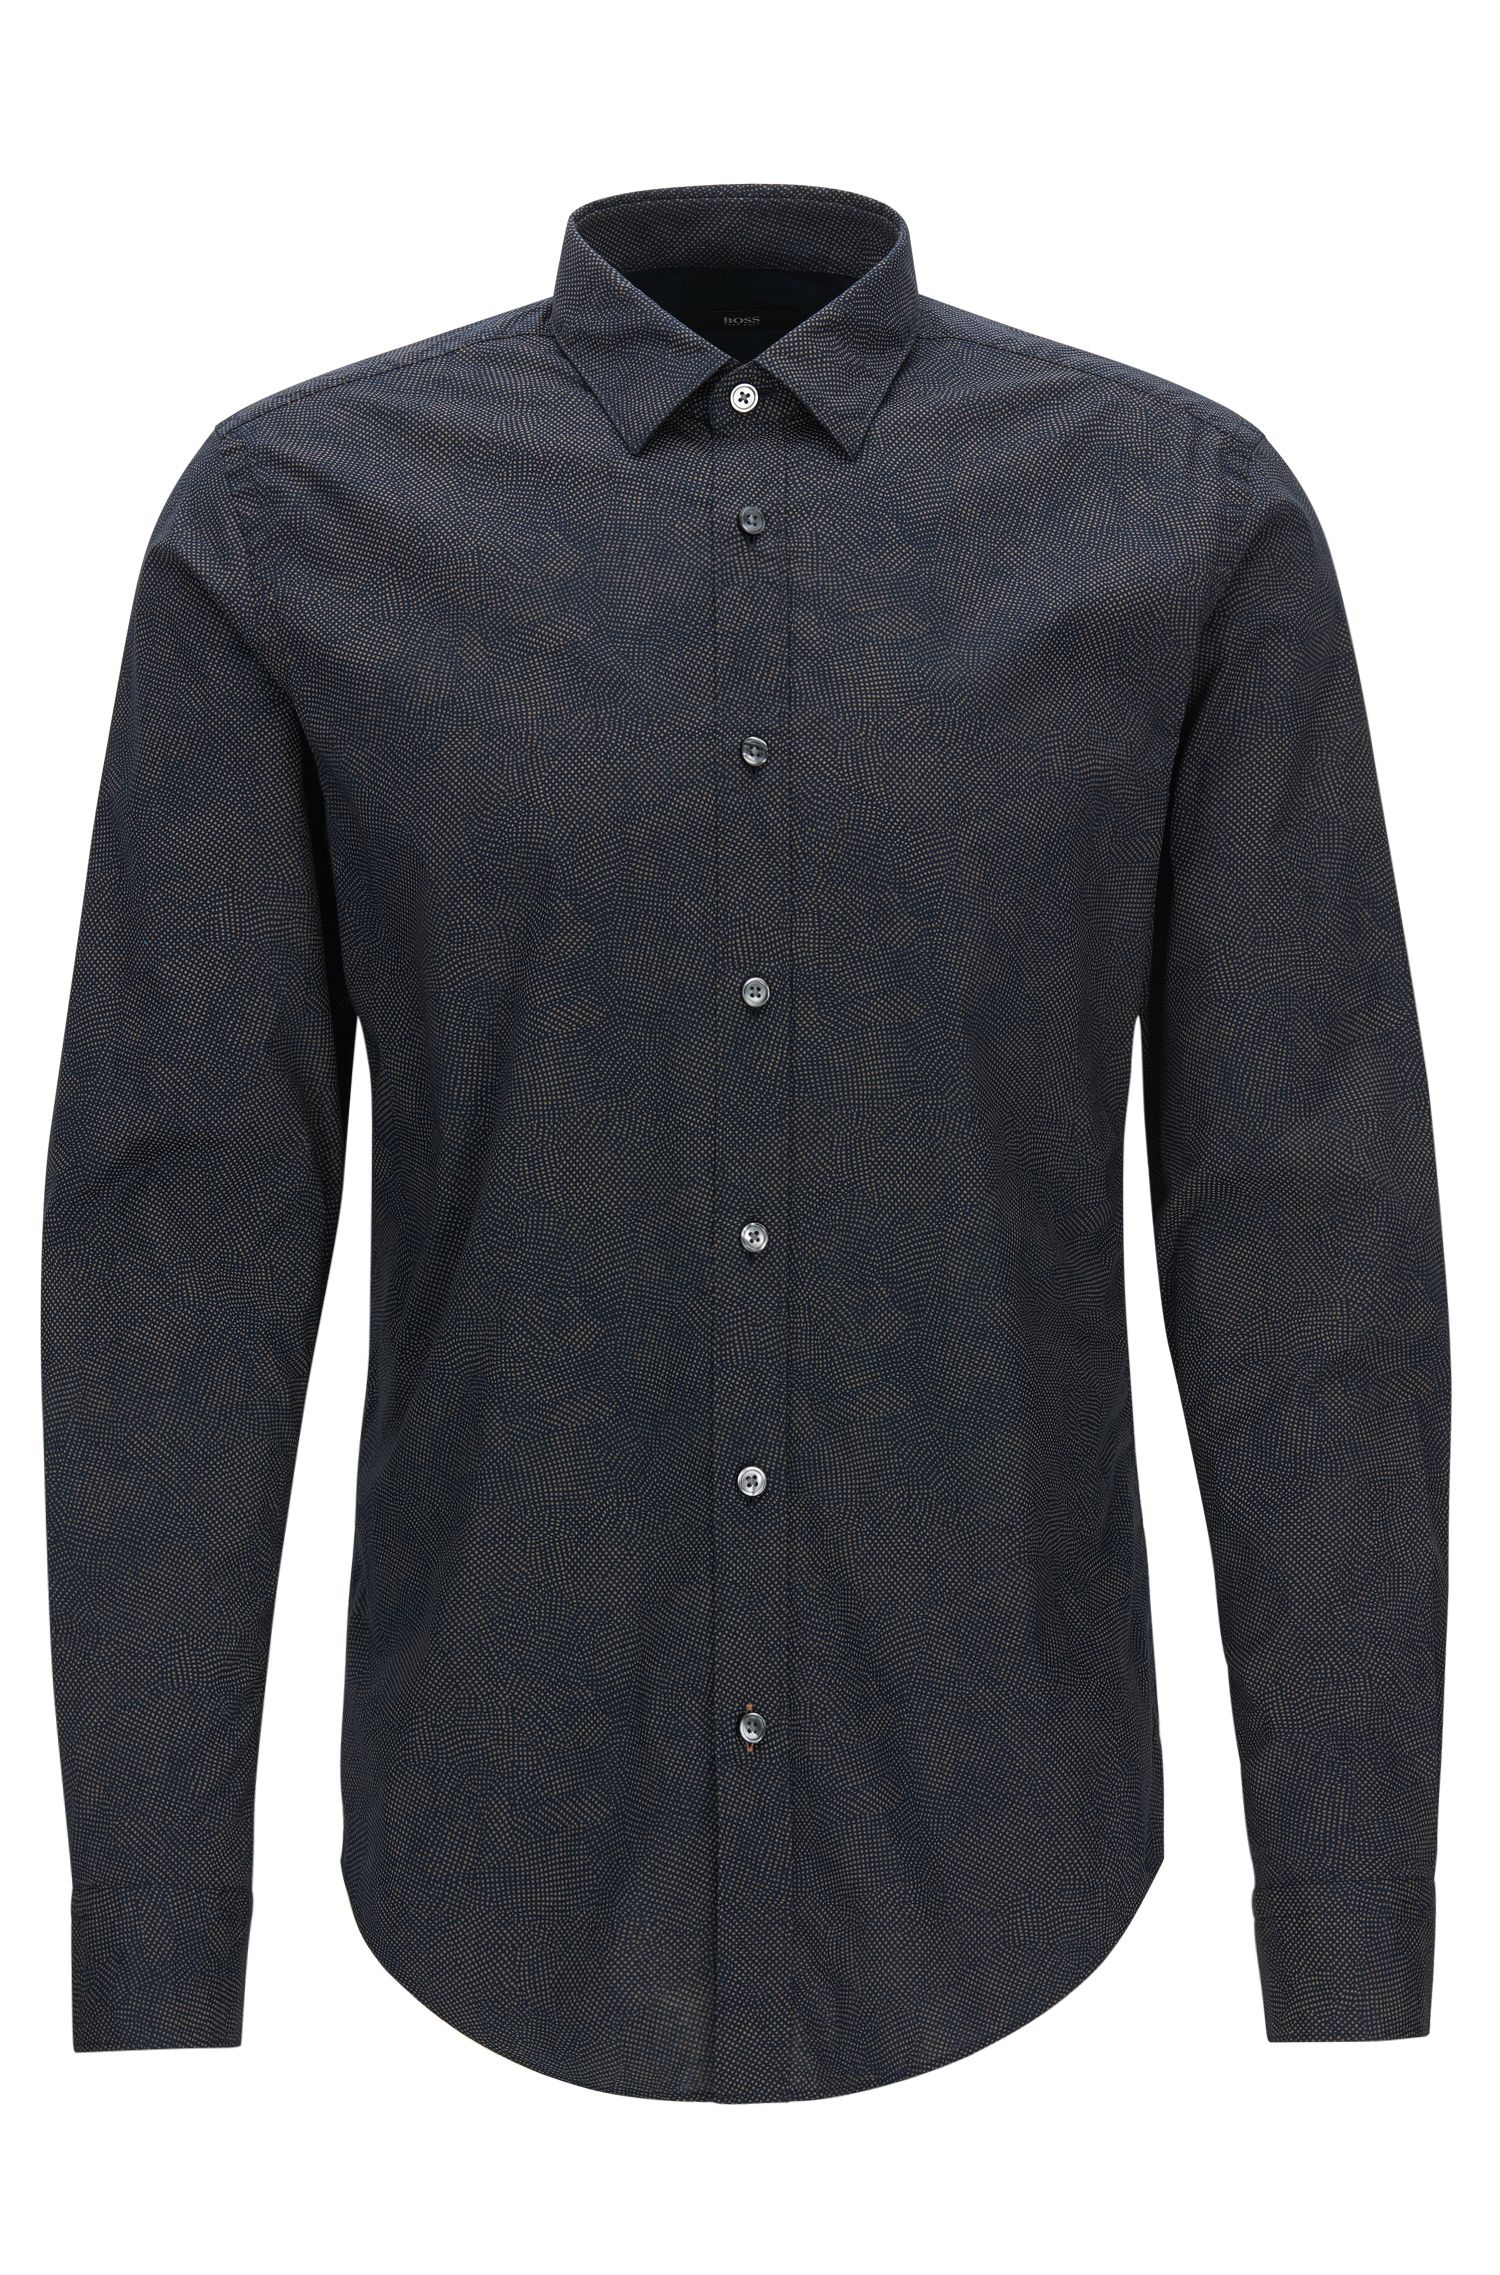 'Ronni' | Slim Fit, Microdot Stretch Cotton Poplin Button Down Shirt